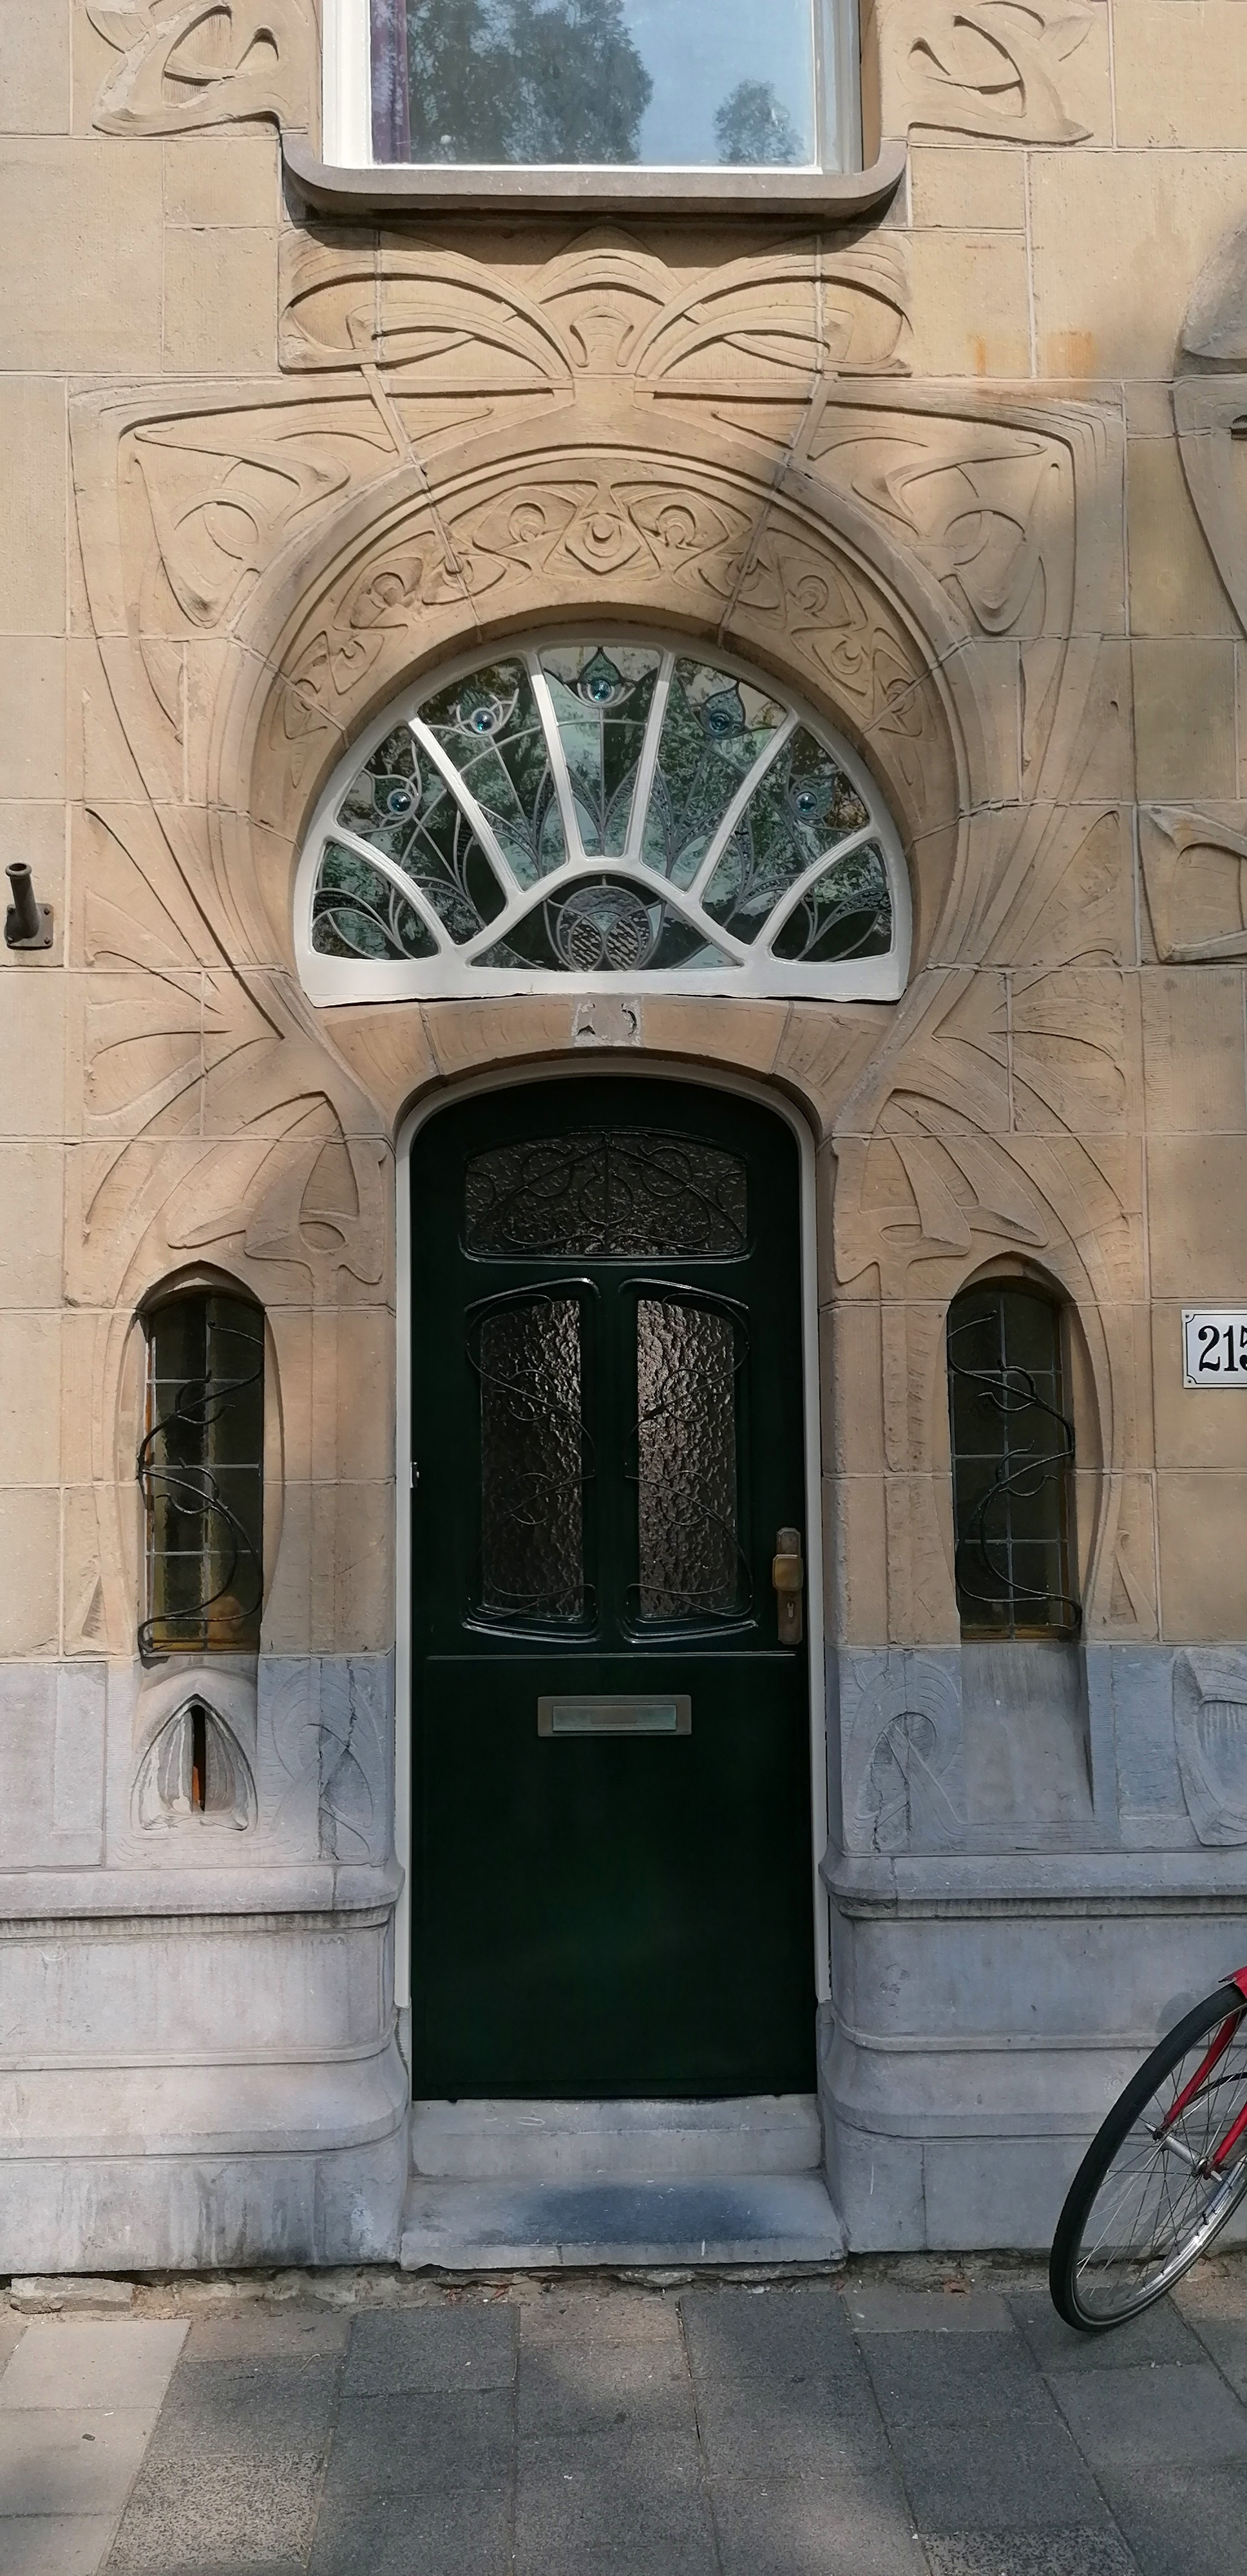 entree jugendstil art nouveau huis aan Laan van Meerdervoort nr. 215 Den Haag